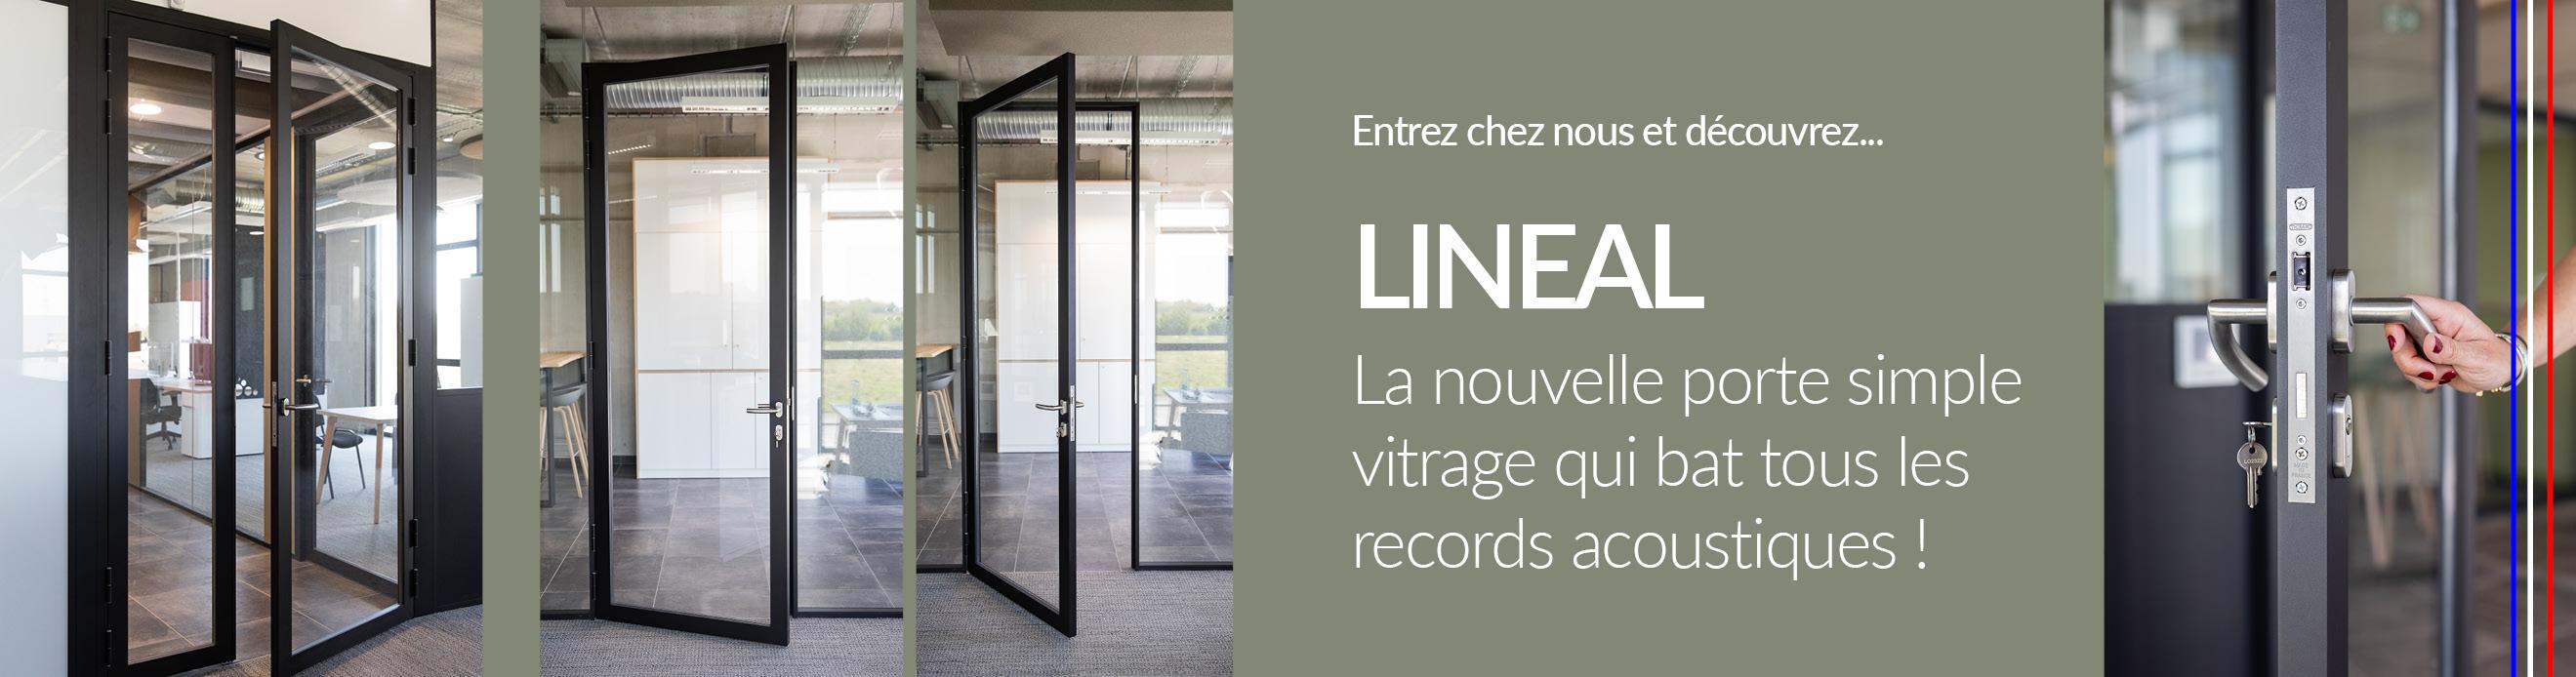 Porte lineal